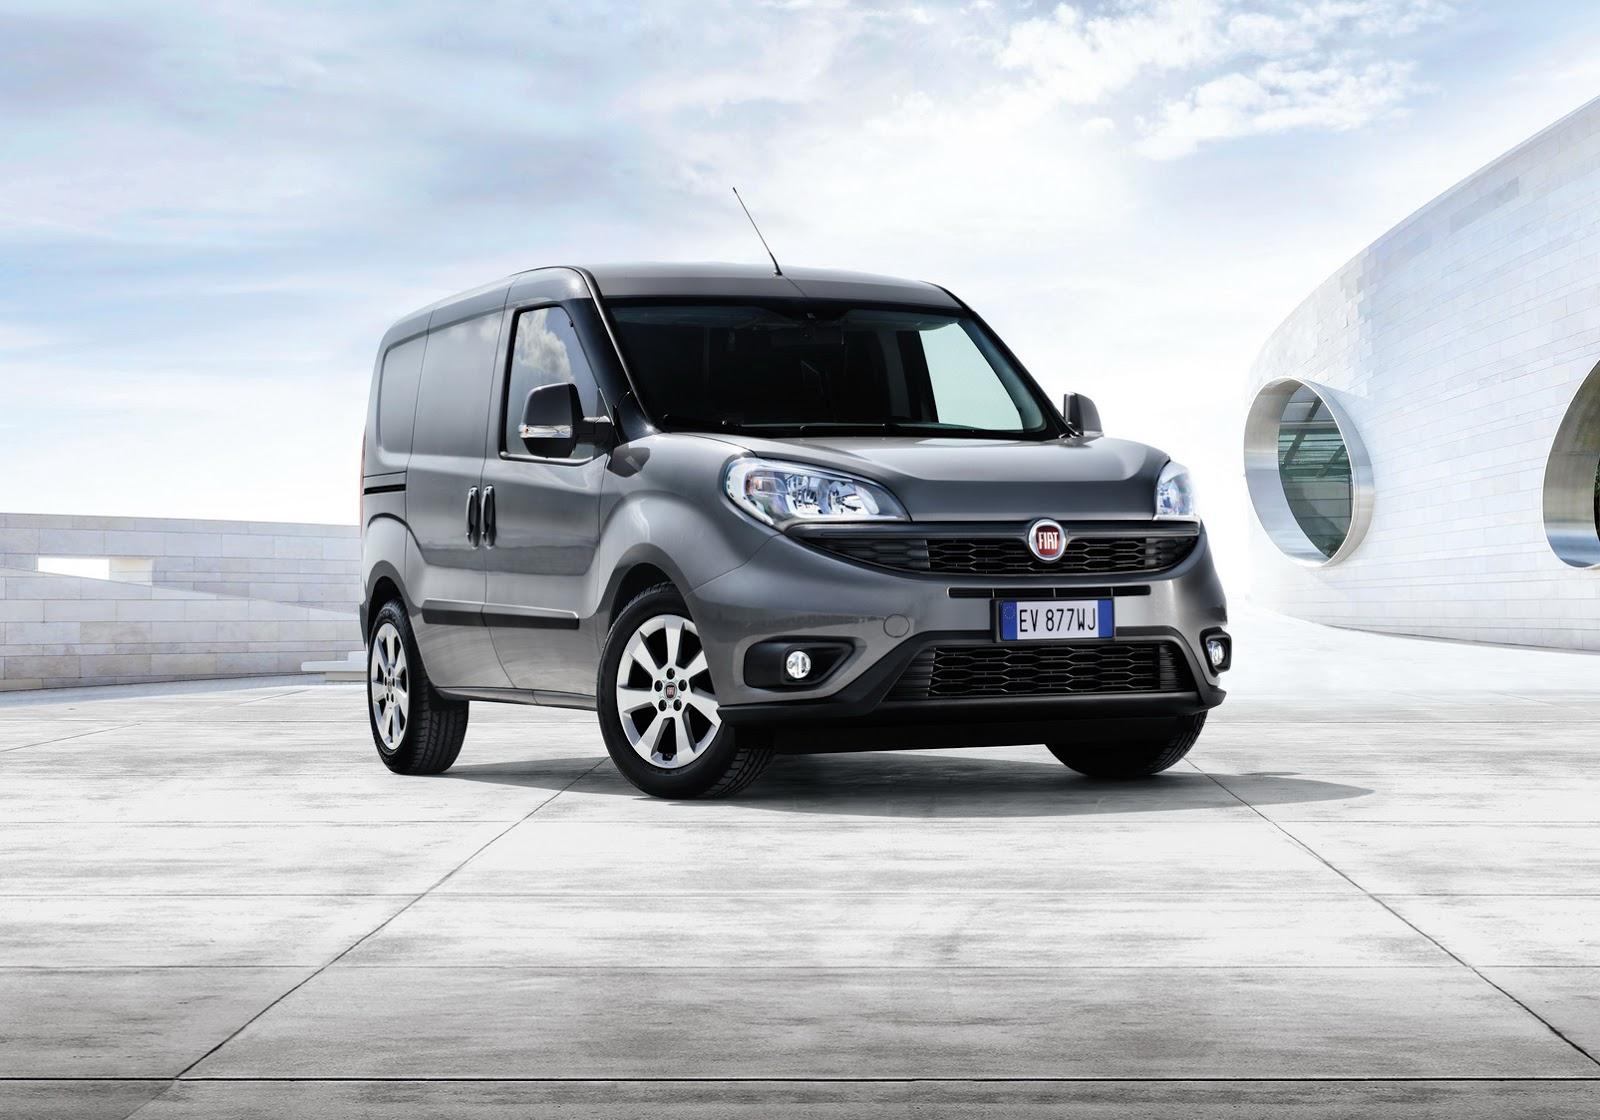 Click image for larger version  Name:2015-Fiat-Doblo-FL-1.jpg Views:52 Size:253.9 KB ID:144456